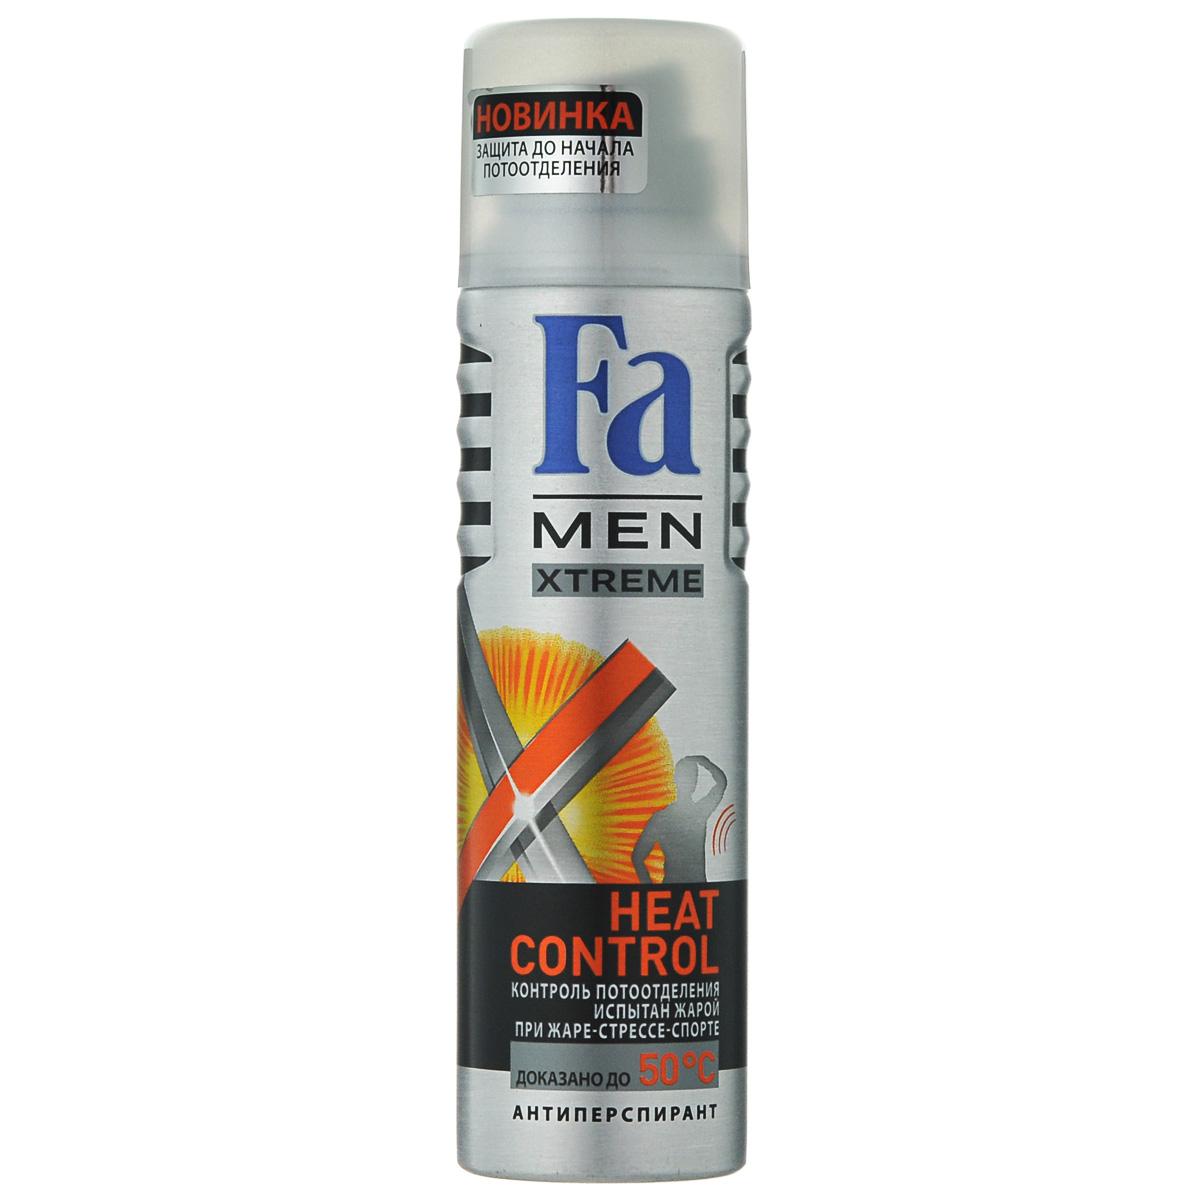 Fa MEN Дезодорант-антиперспирант аэрозоль Xtreme Heat Control, 150 мл дезодорант аэрозоль fa men xtreme invisible